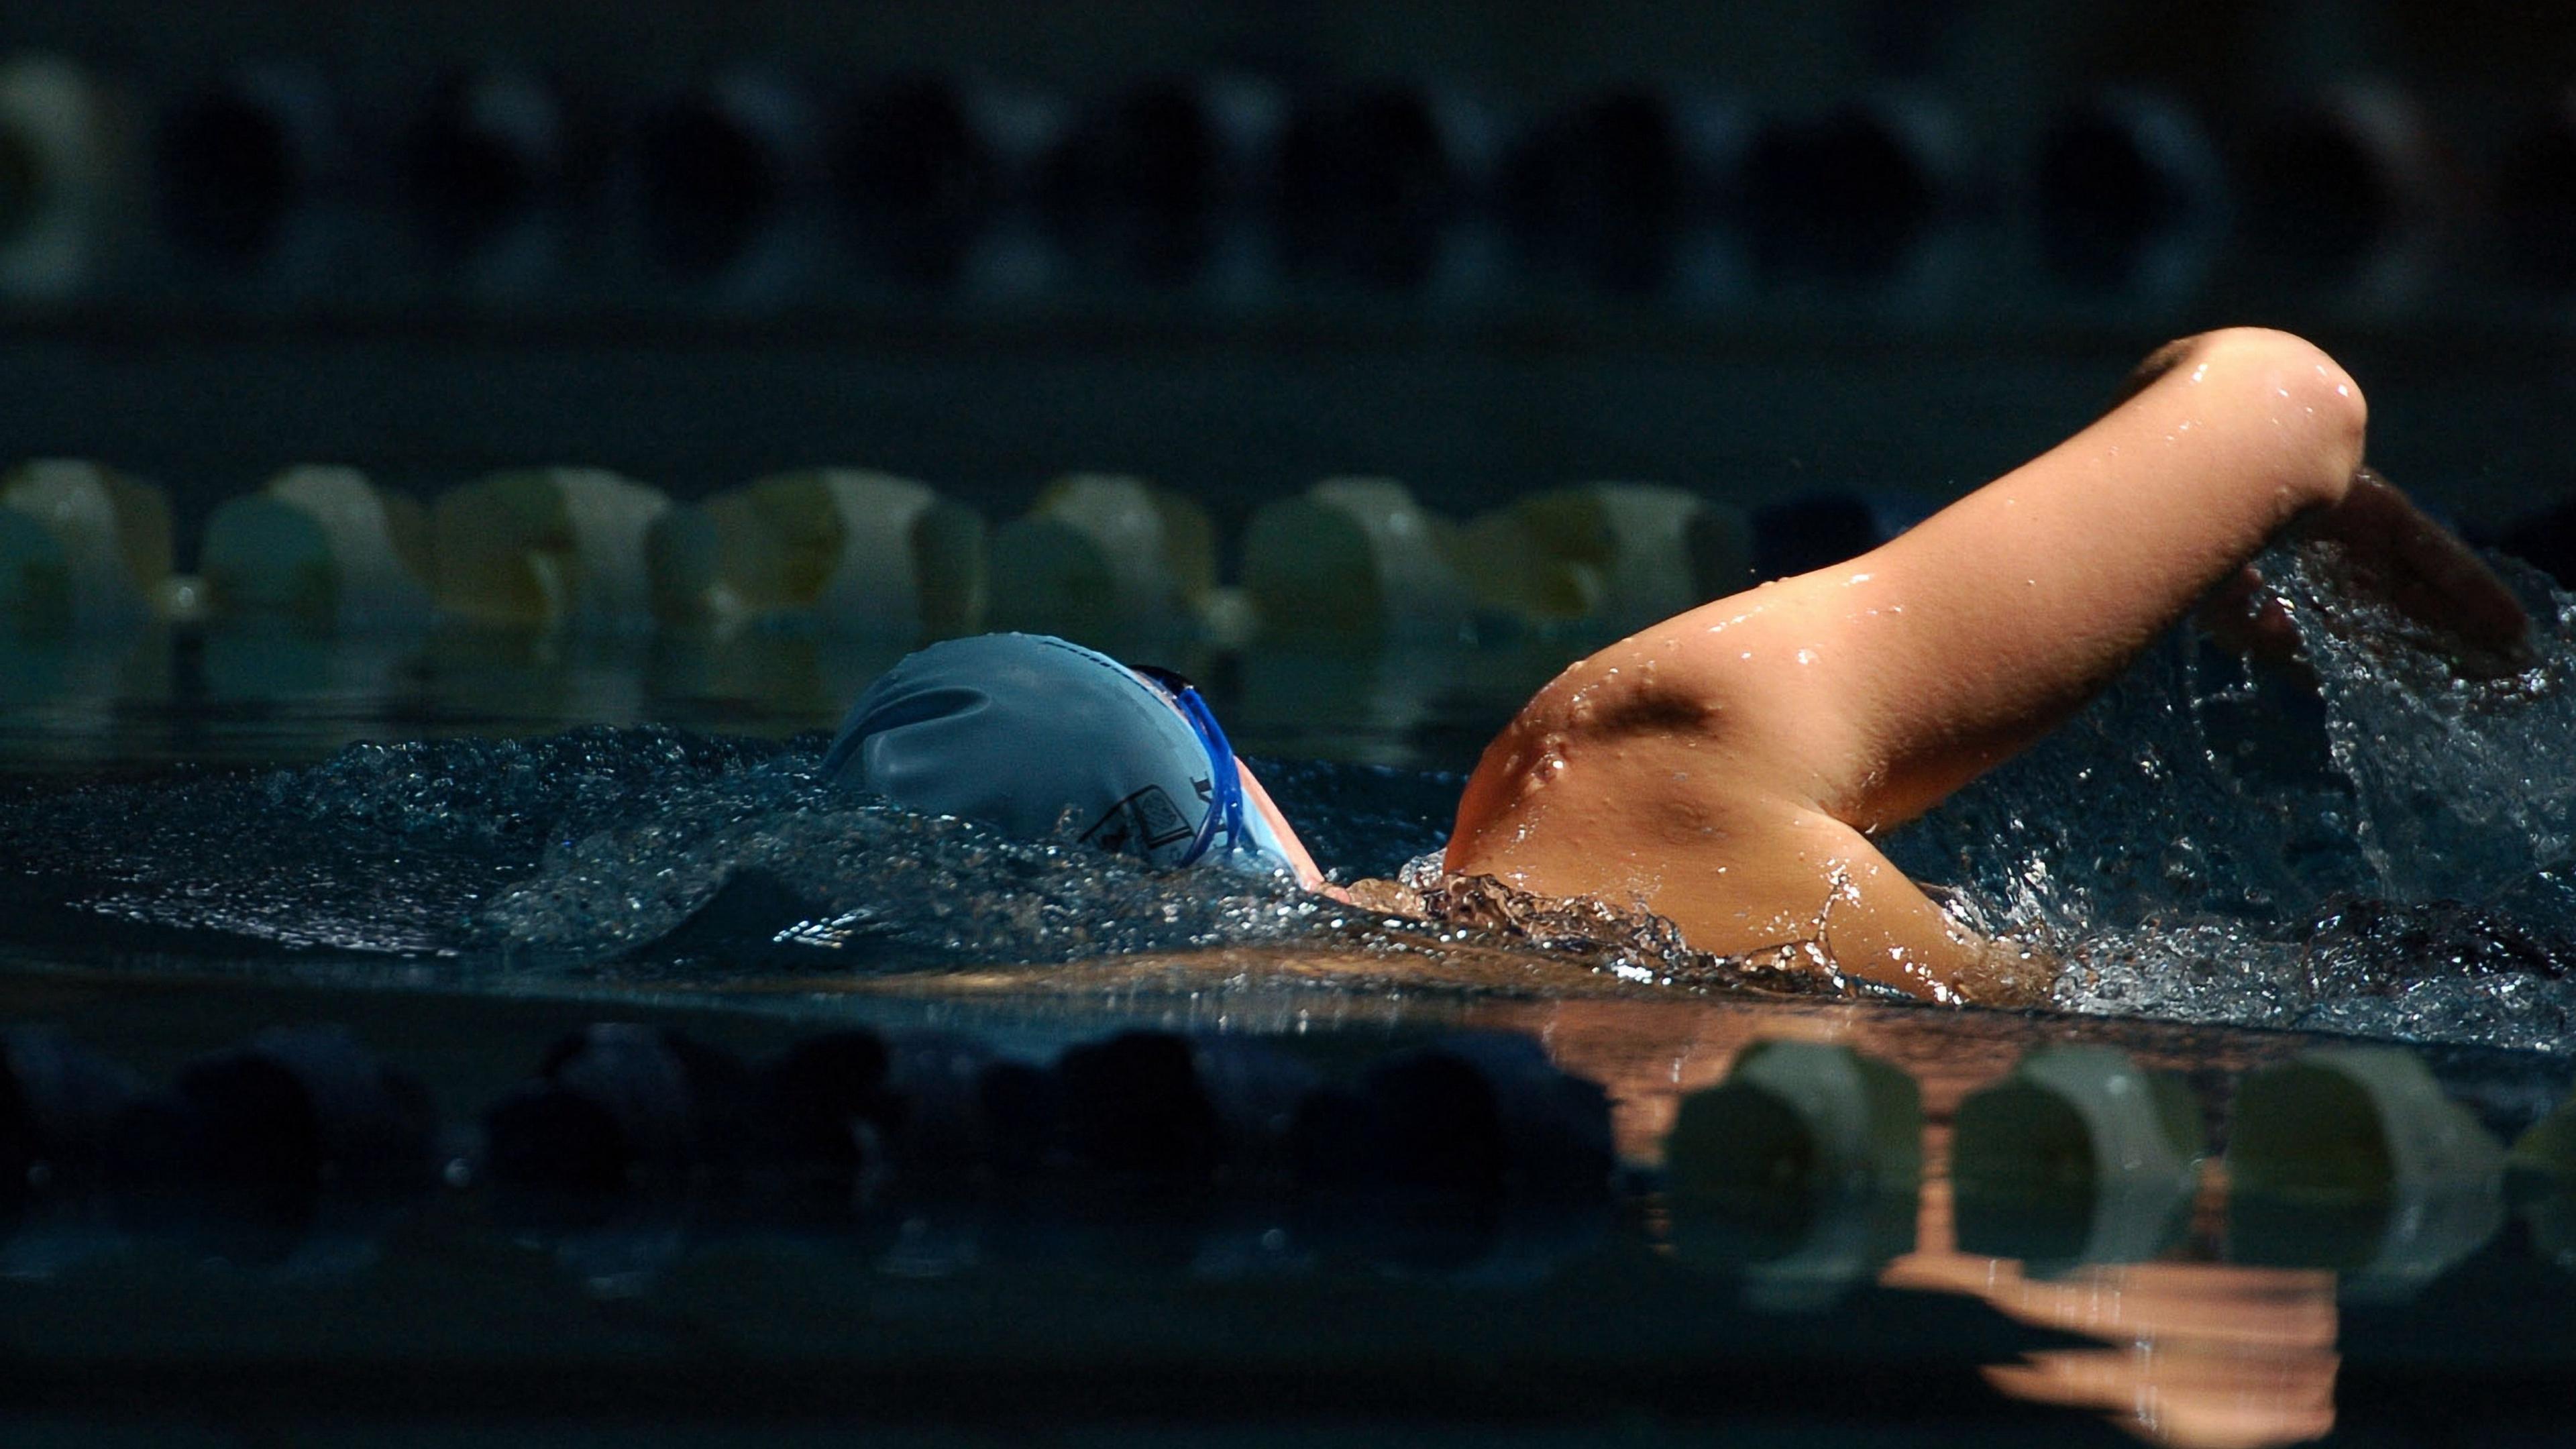 swimmer swimming pool night 4k 1540062993 - swimmer, swimming pool, night 4k - swimming pool, swimmer, Night